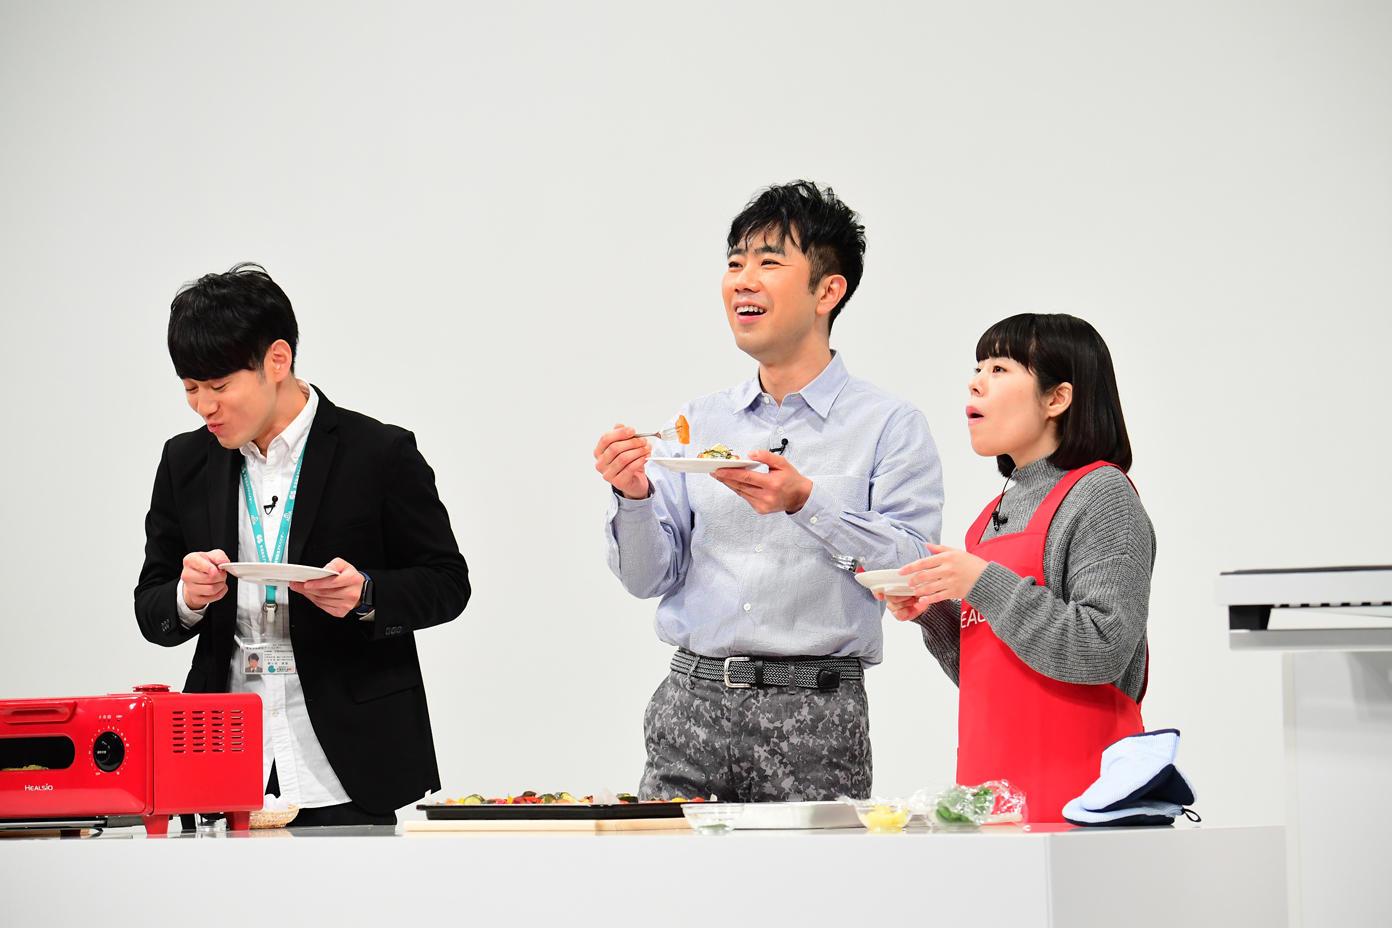 http://news.yoshimoto.co.jp/20170414143757-fecc444fc6bd435460f28efcb133086455472be0.jpg